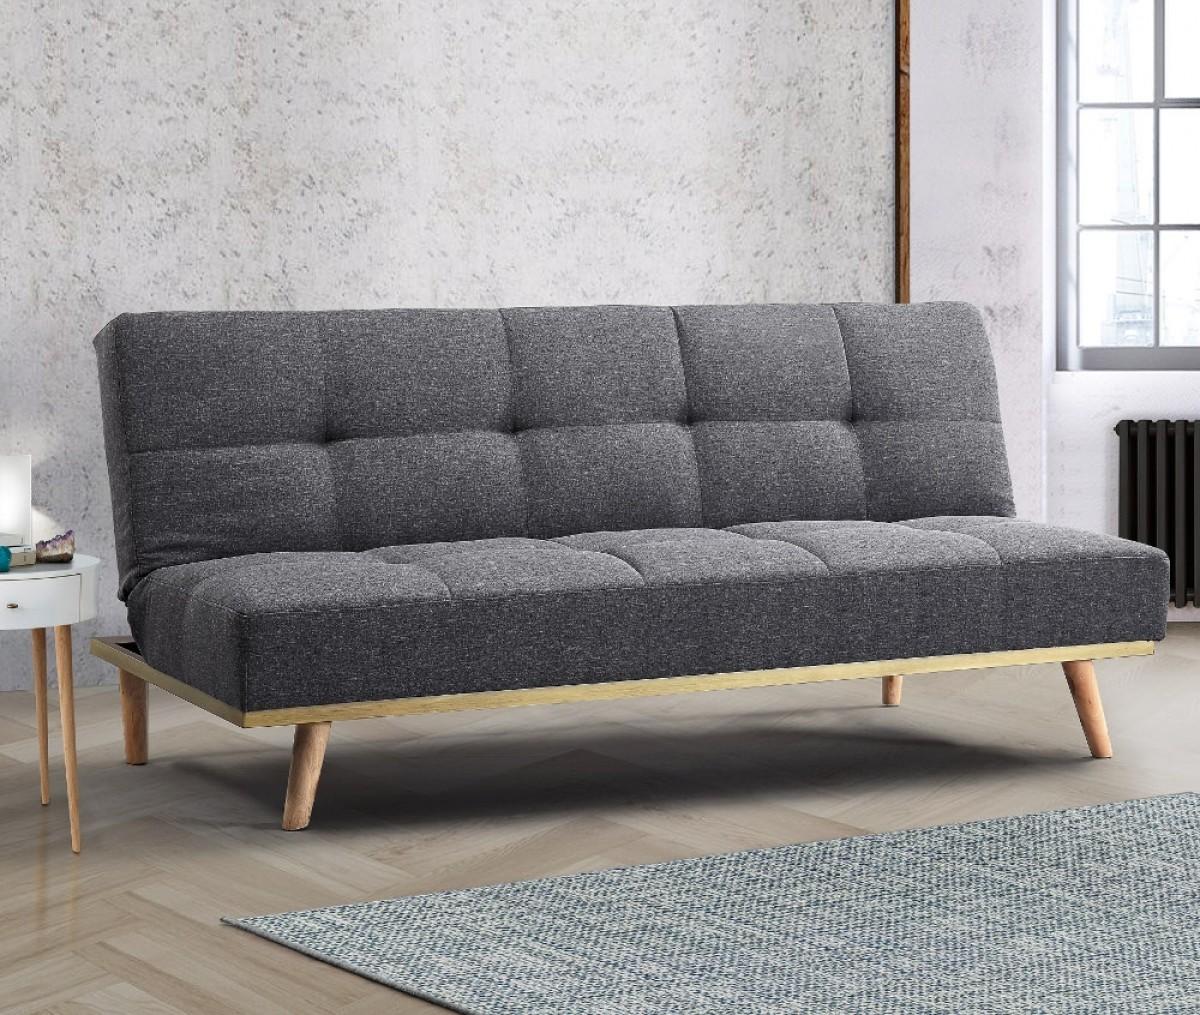 Snug Grey Fabric Sofa Bed